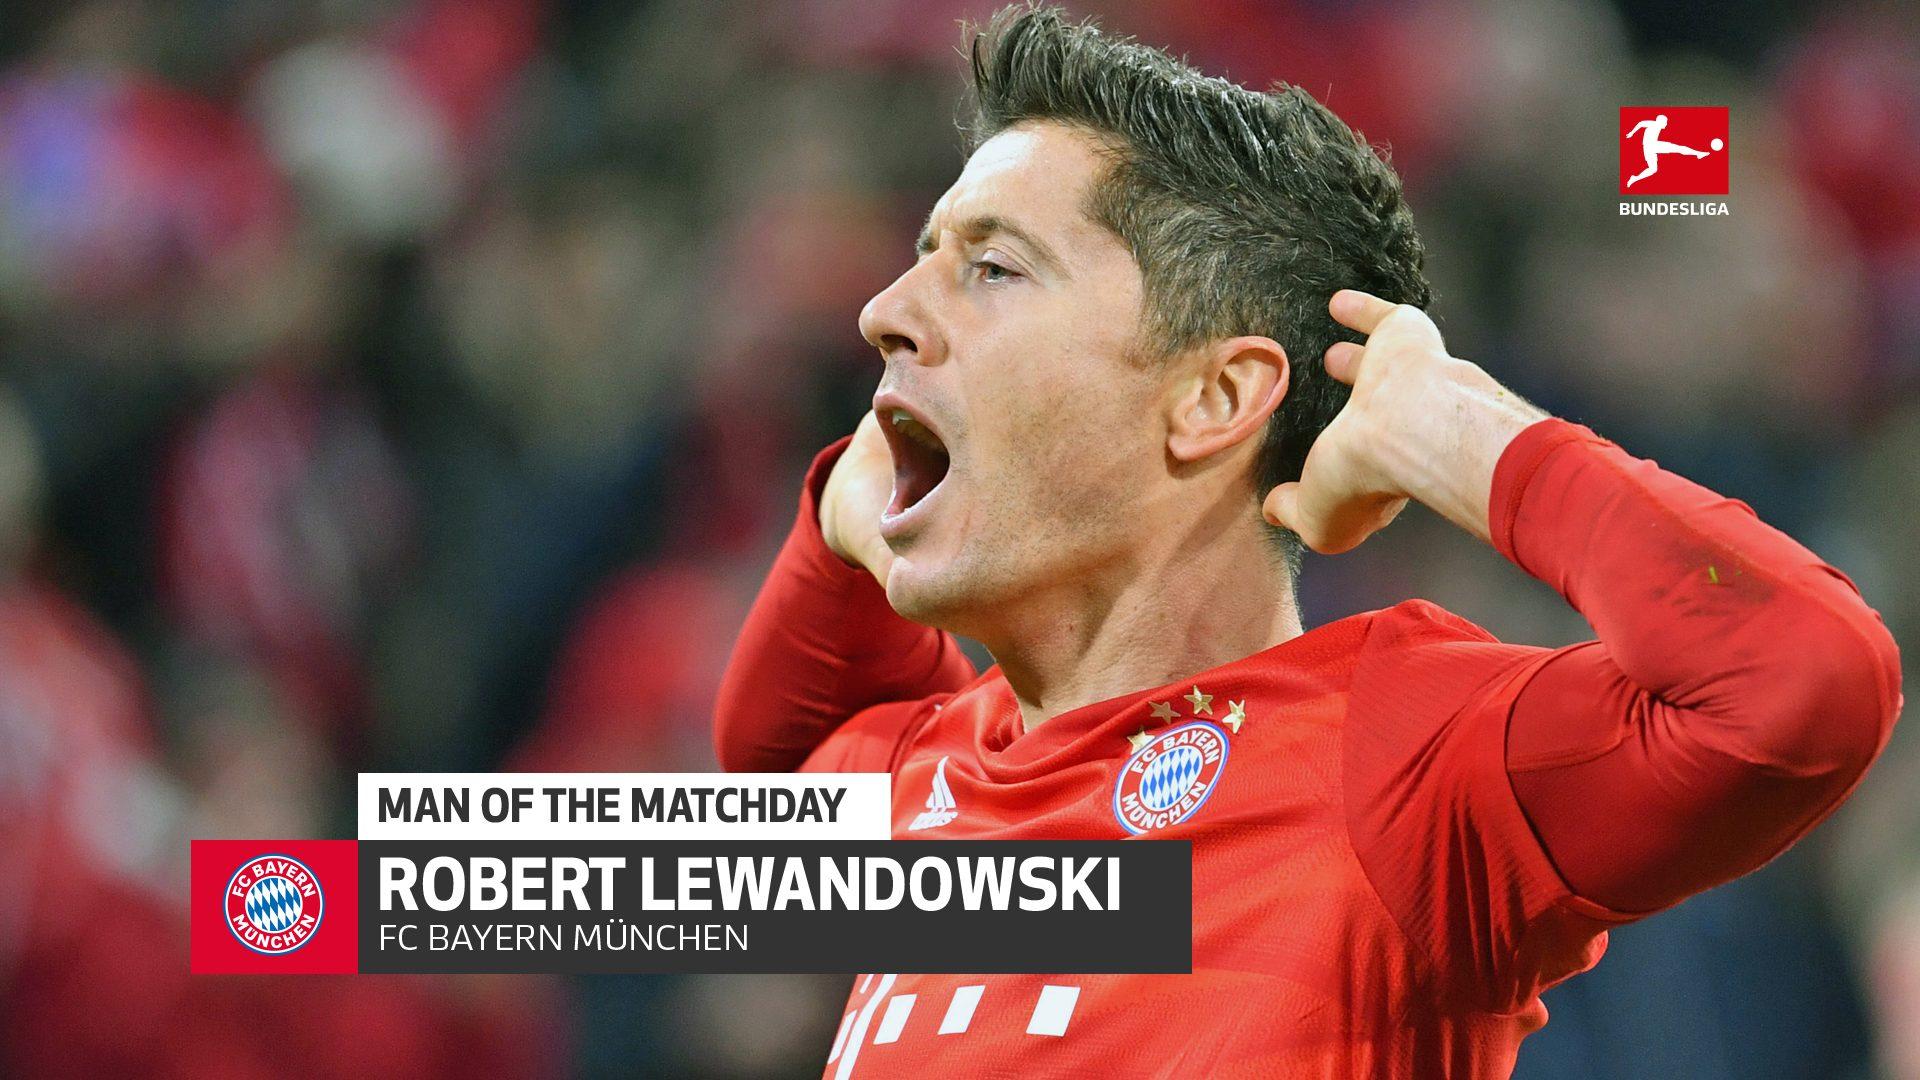 Lewandowski: MD11's Man of the Matchday